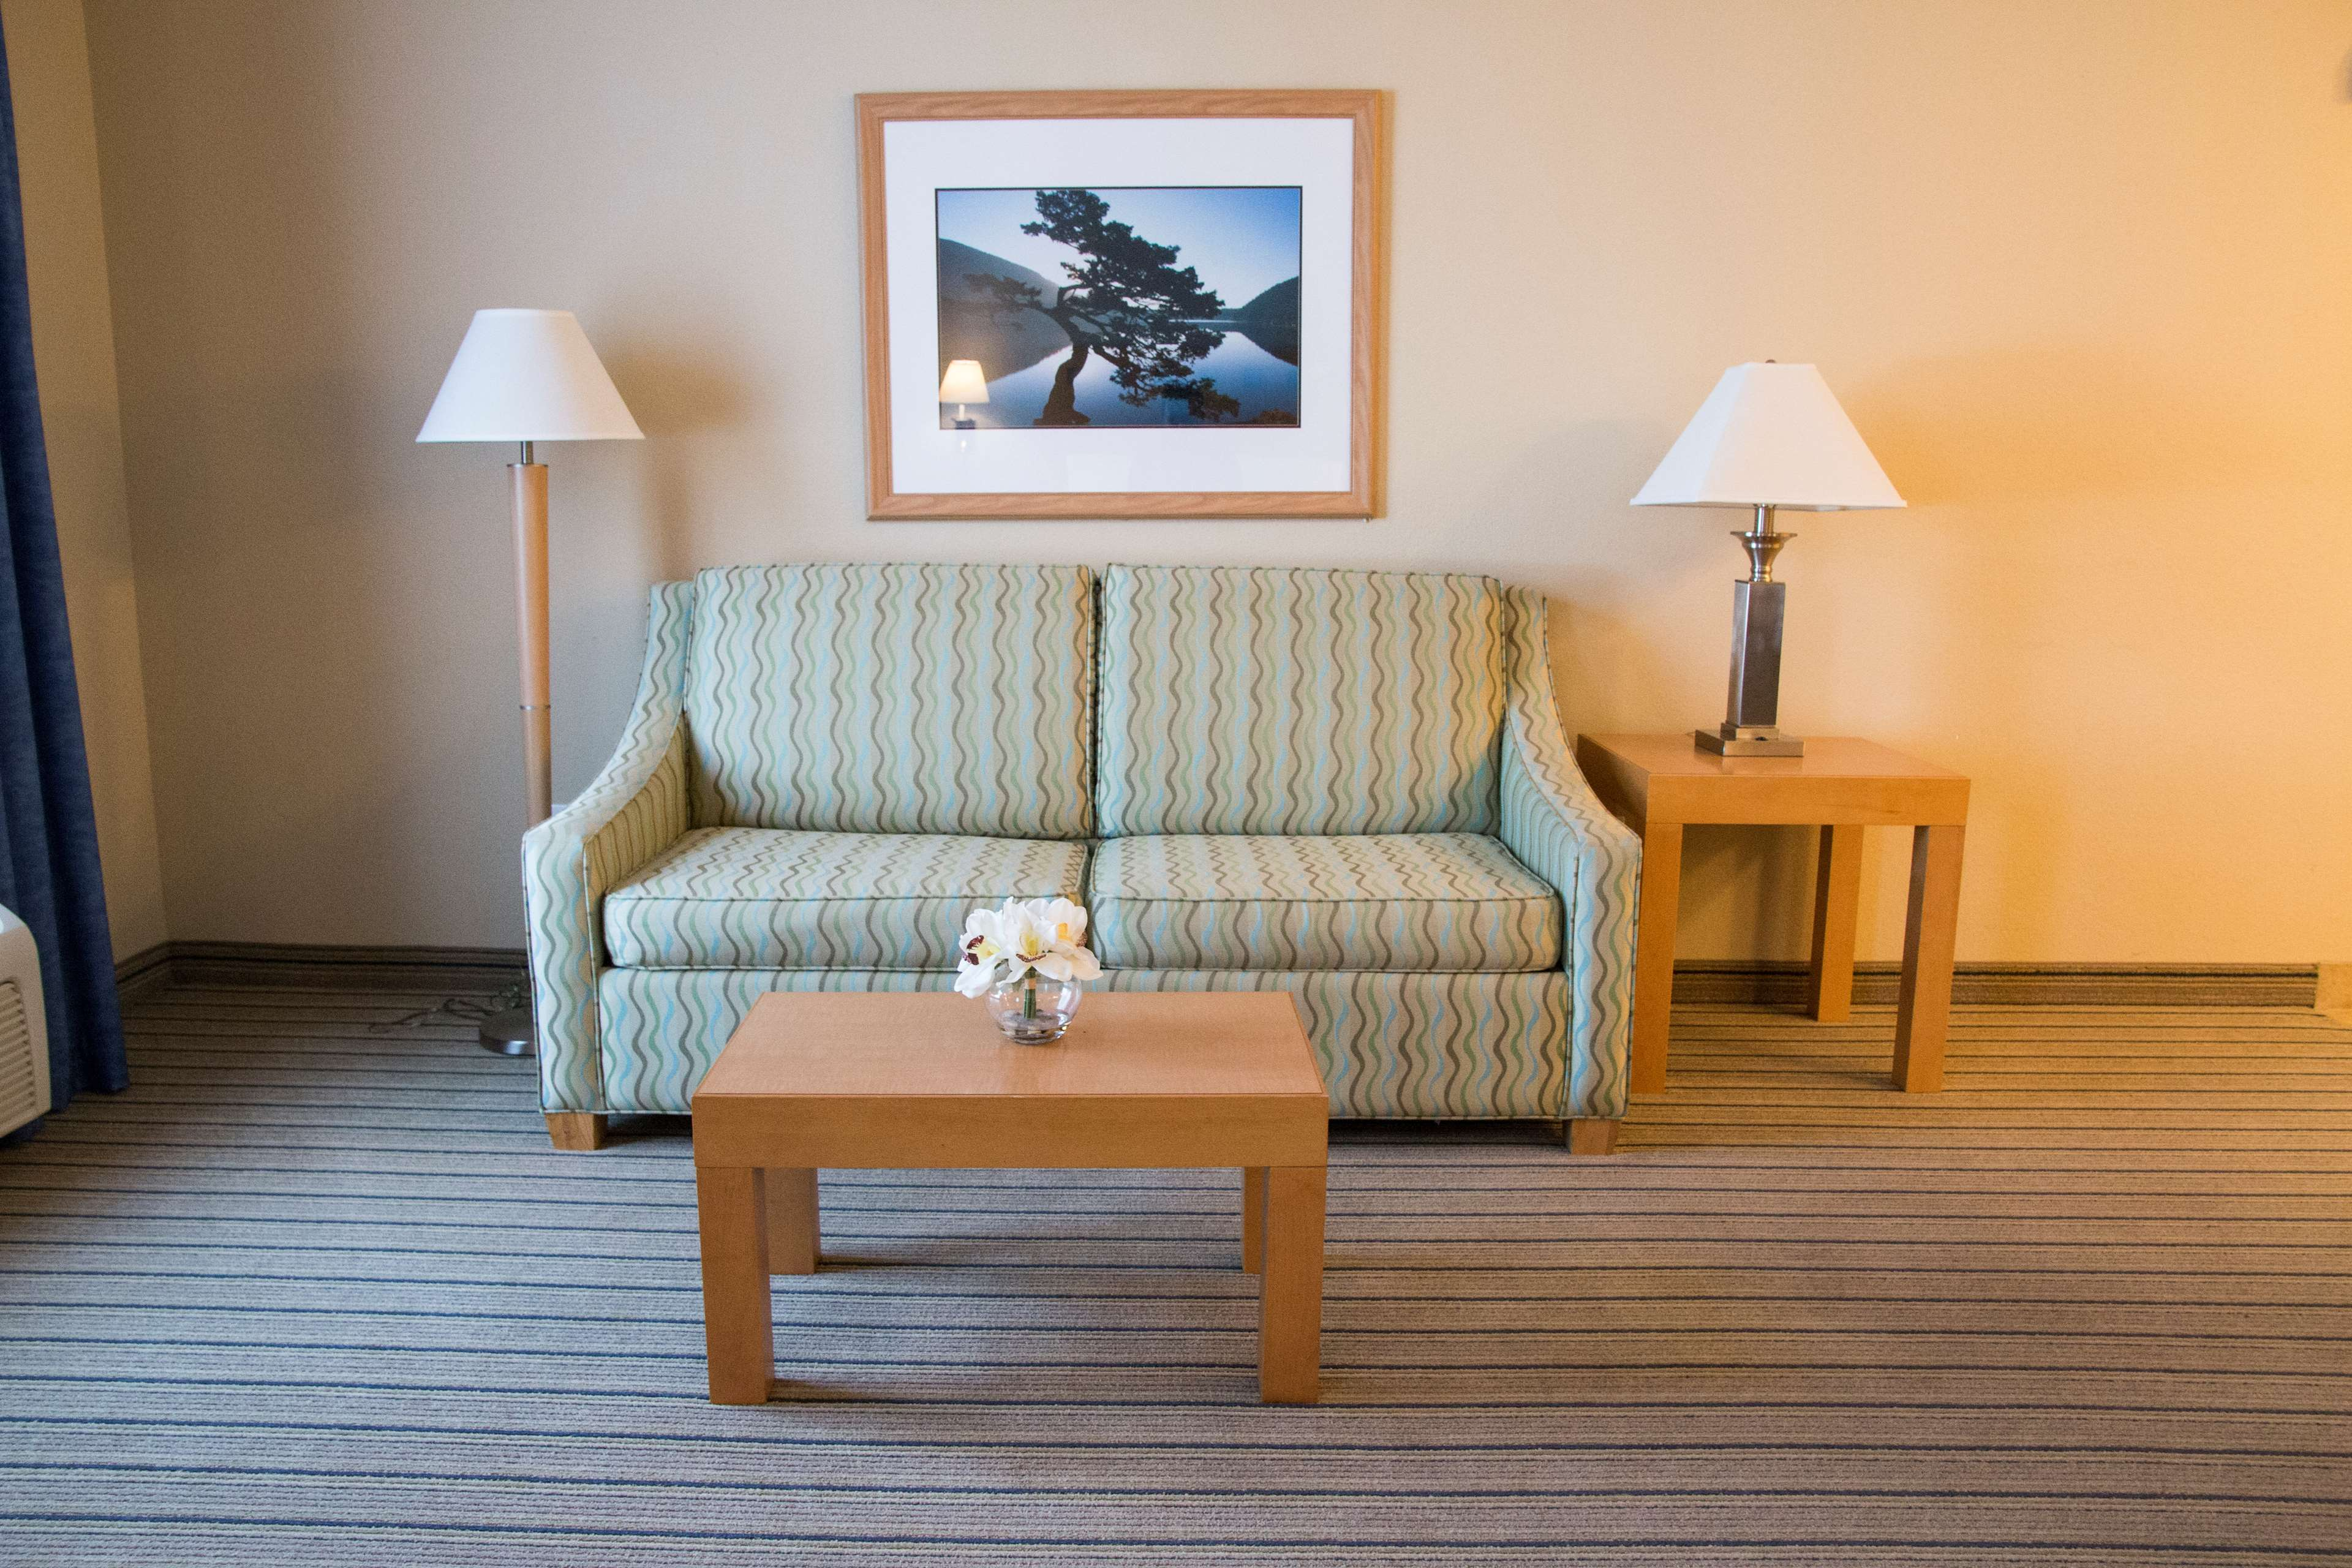 Hampton Inn & Suites Madera image 37